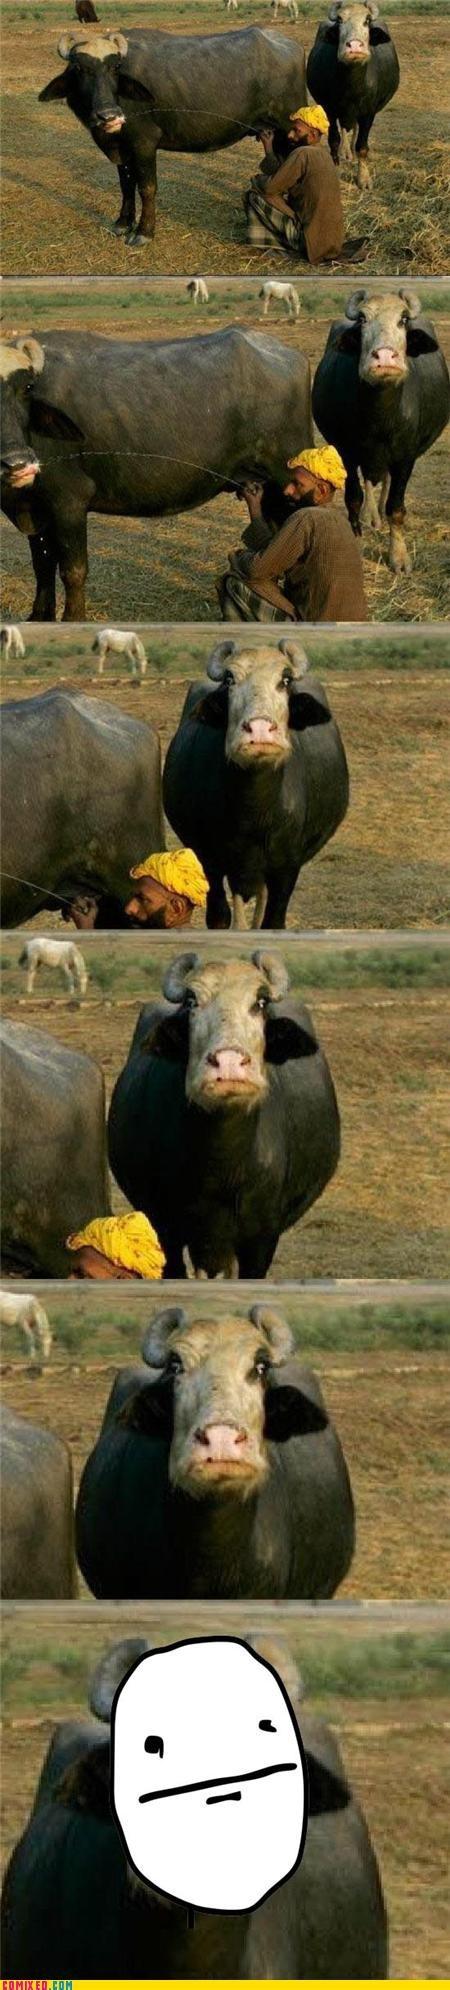 animals cows makes sense poker face recycling wtf - 4362365952